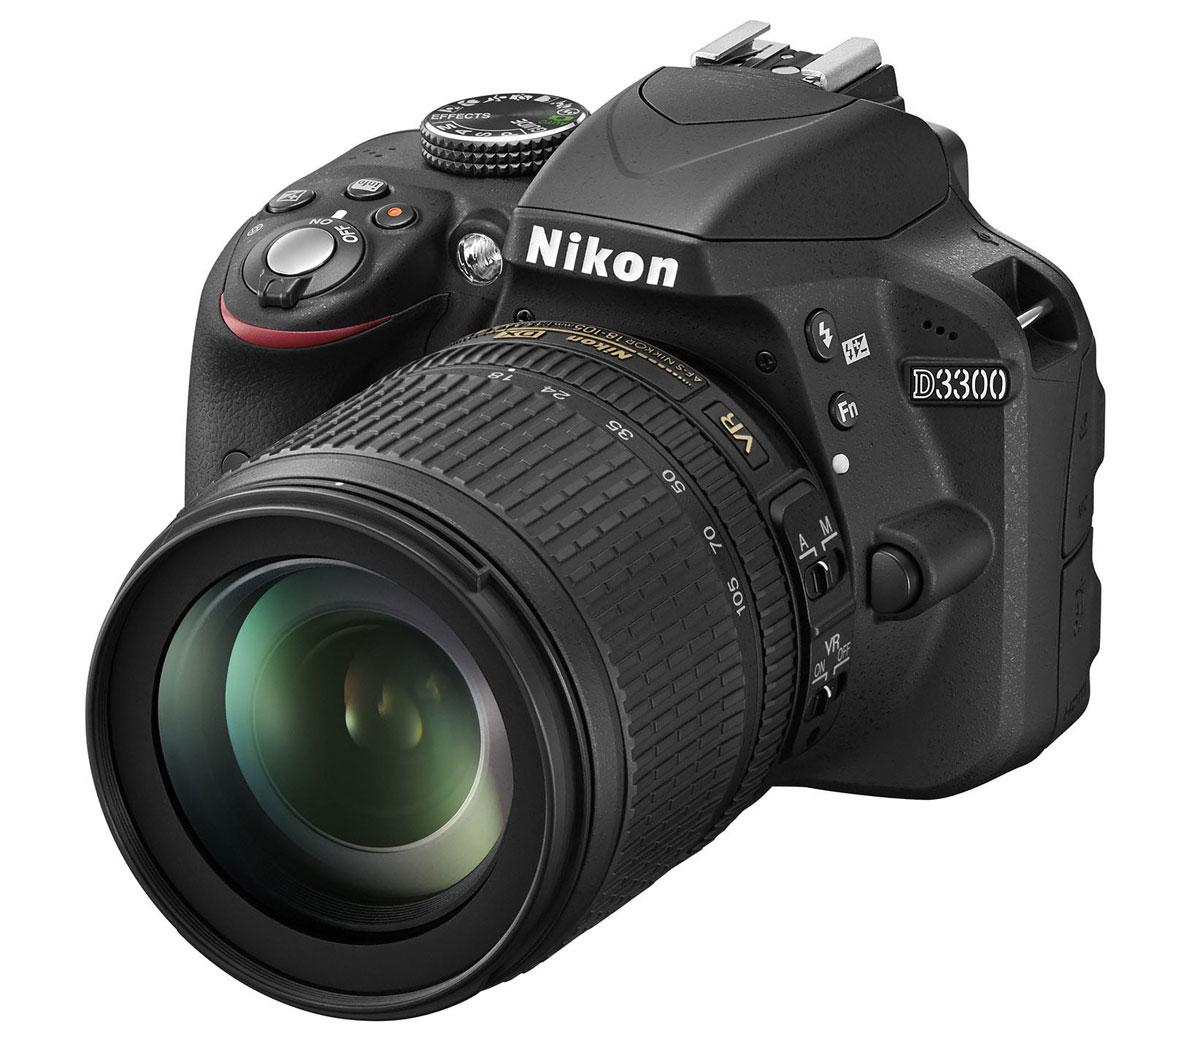 Nikon D3300 Kit 18-105 VR, Black цифровая зеркальная фотокамера nikon d3400 kit 18 105 vr vba490k003 цифровой зеркальный фотоаппарат black